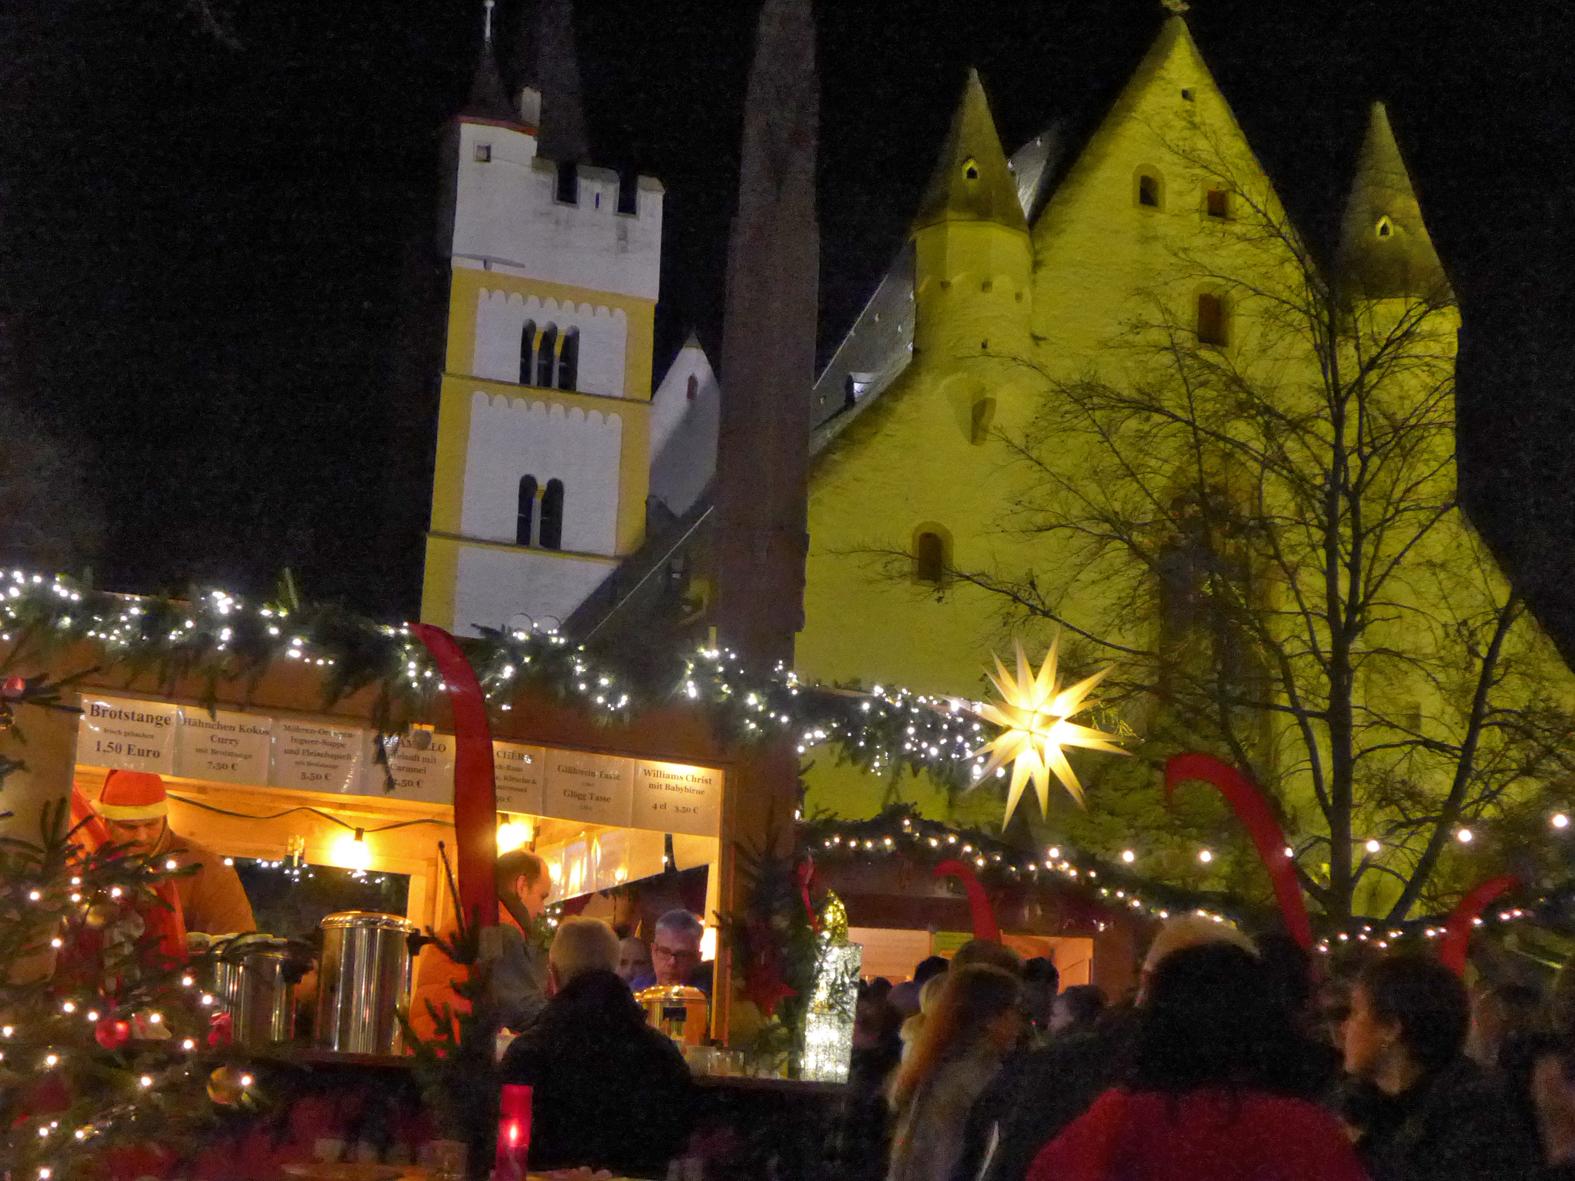 Ingelheim am Rhein, Germany